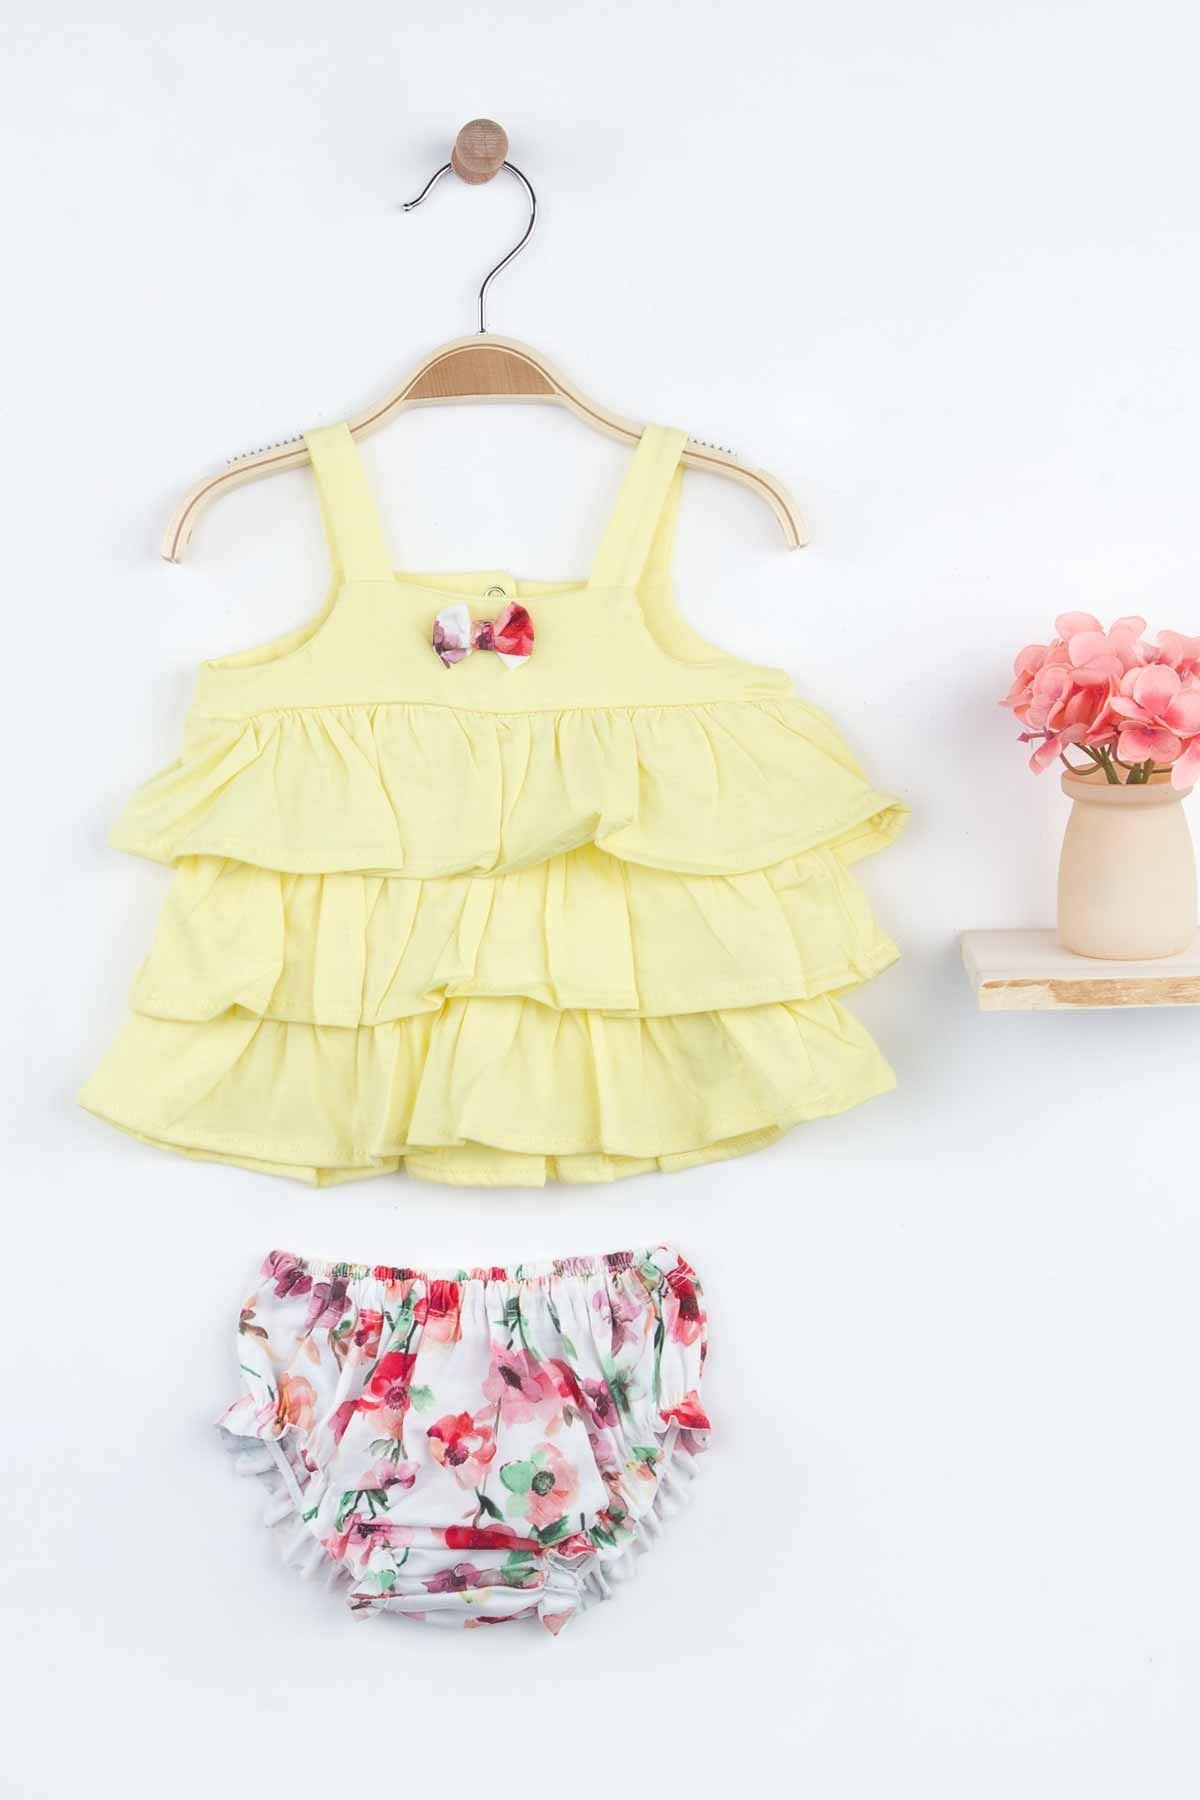 Yellow Summer Baby Girl Suit Shorts Body Hair Bandana Clothing Summer Holiday Girls Babies Comfortable Daily Cotton Underwear Se